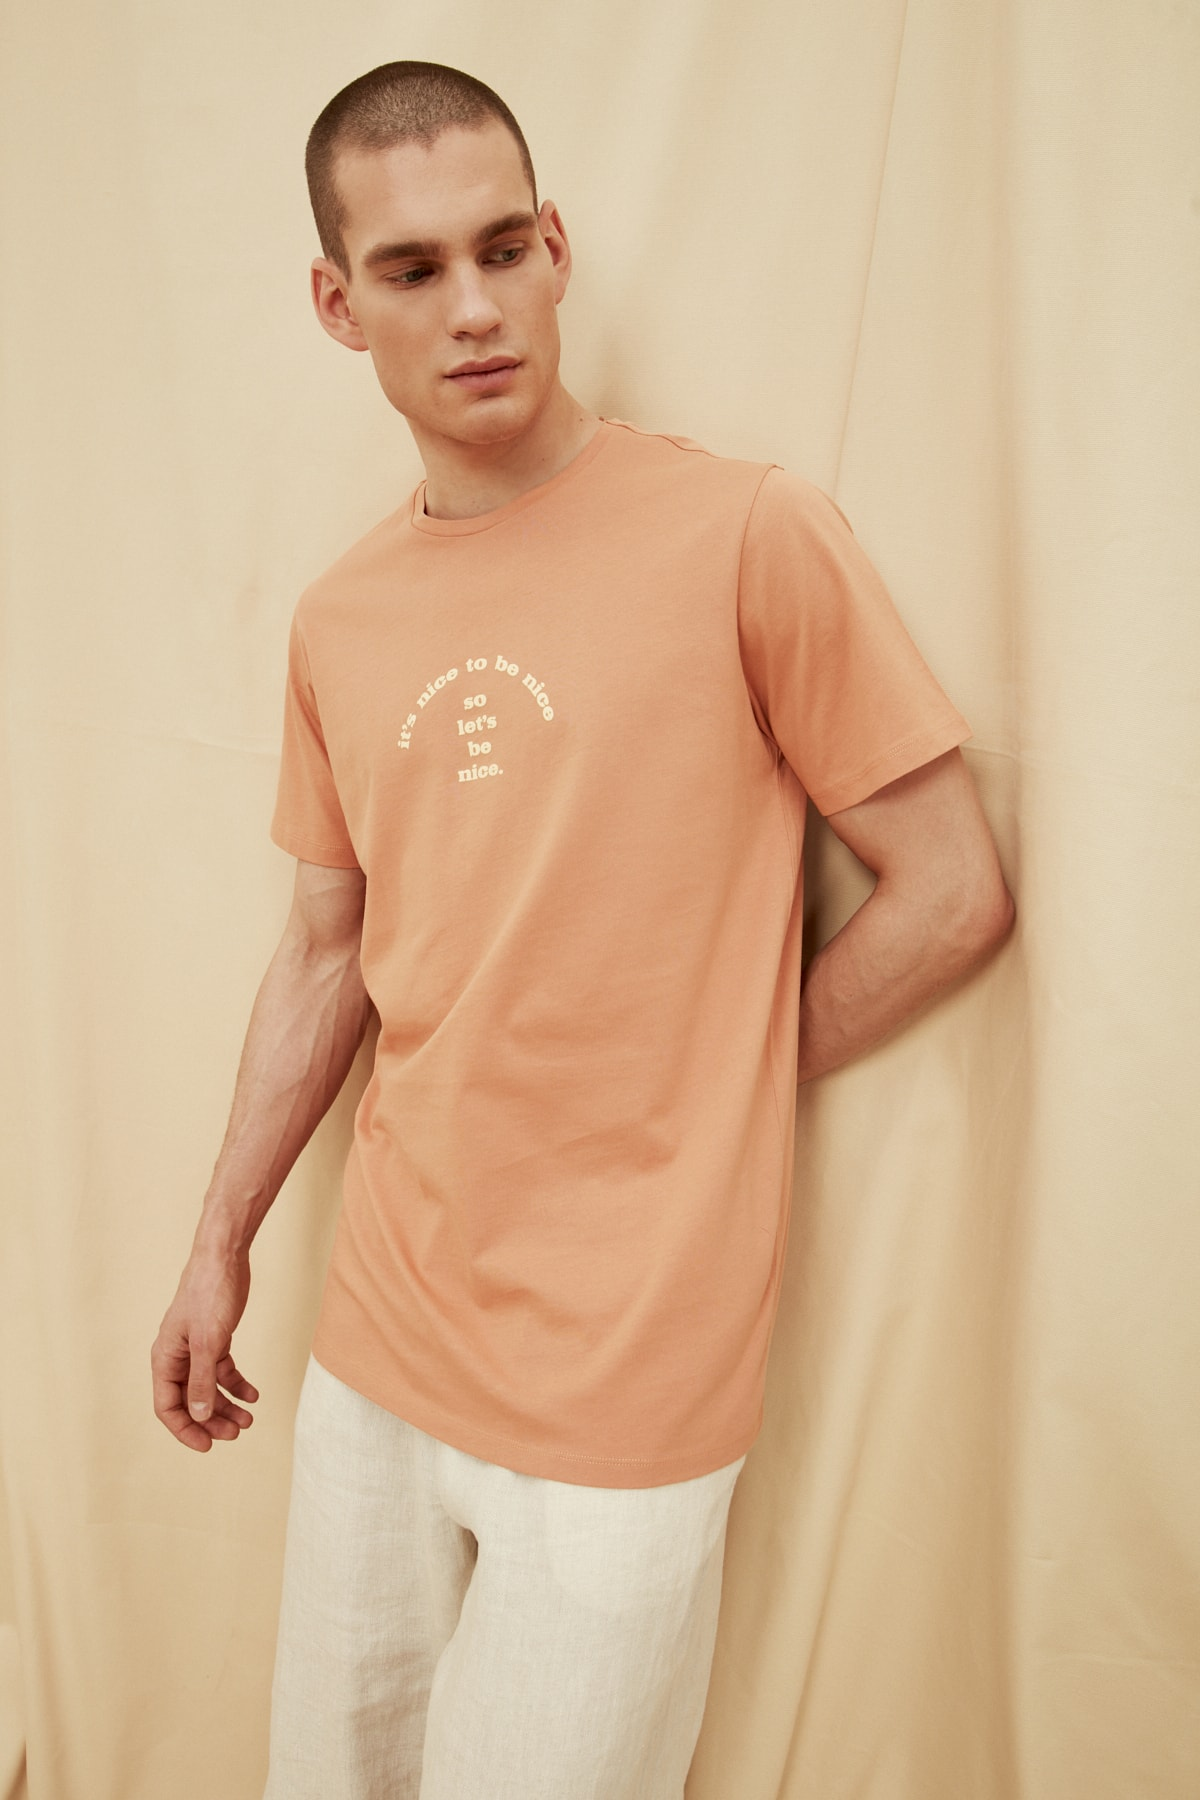 100% Organic Cotton Stylish T Shirt Organic Mens Apparel » Planet Green Eco-Friendly Shop